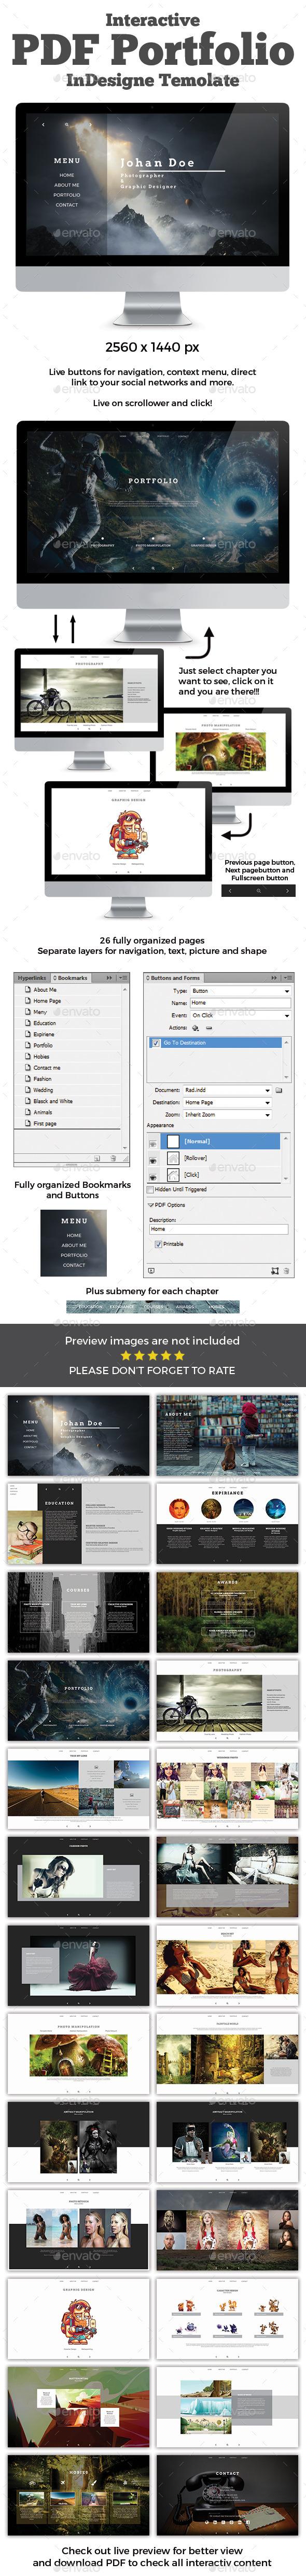 Interactive PDF Prezentation 2560x1440 - Digital Magazines ePublishing